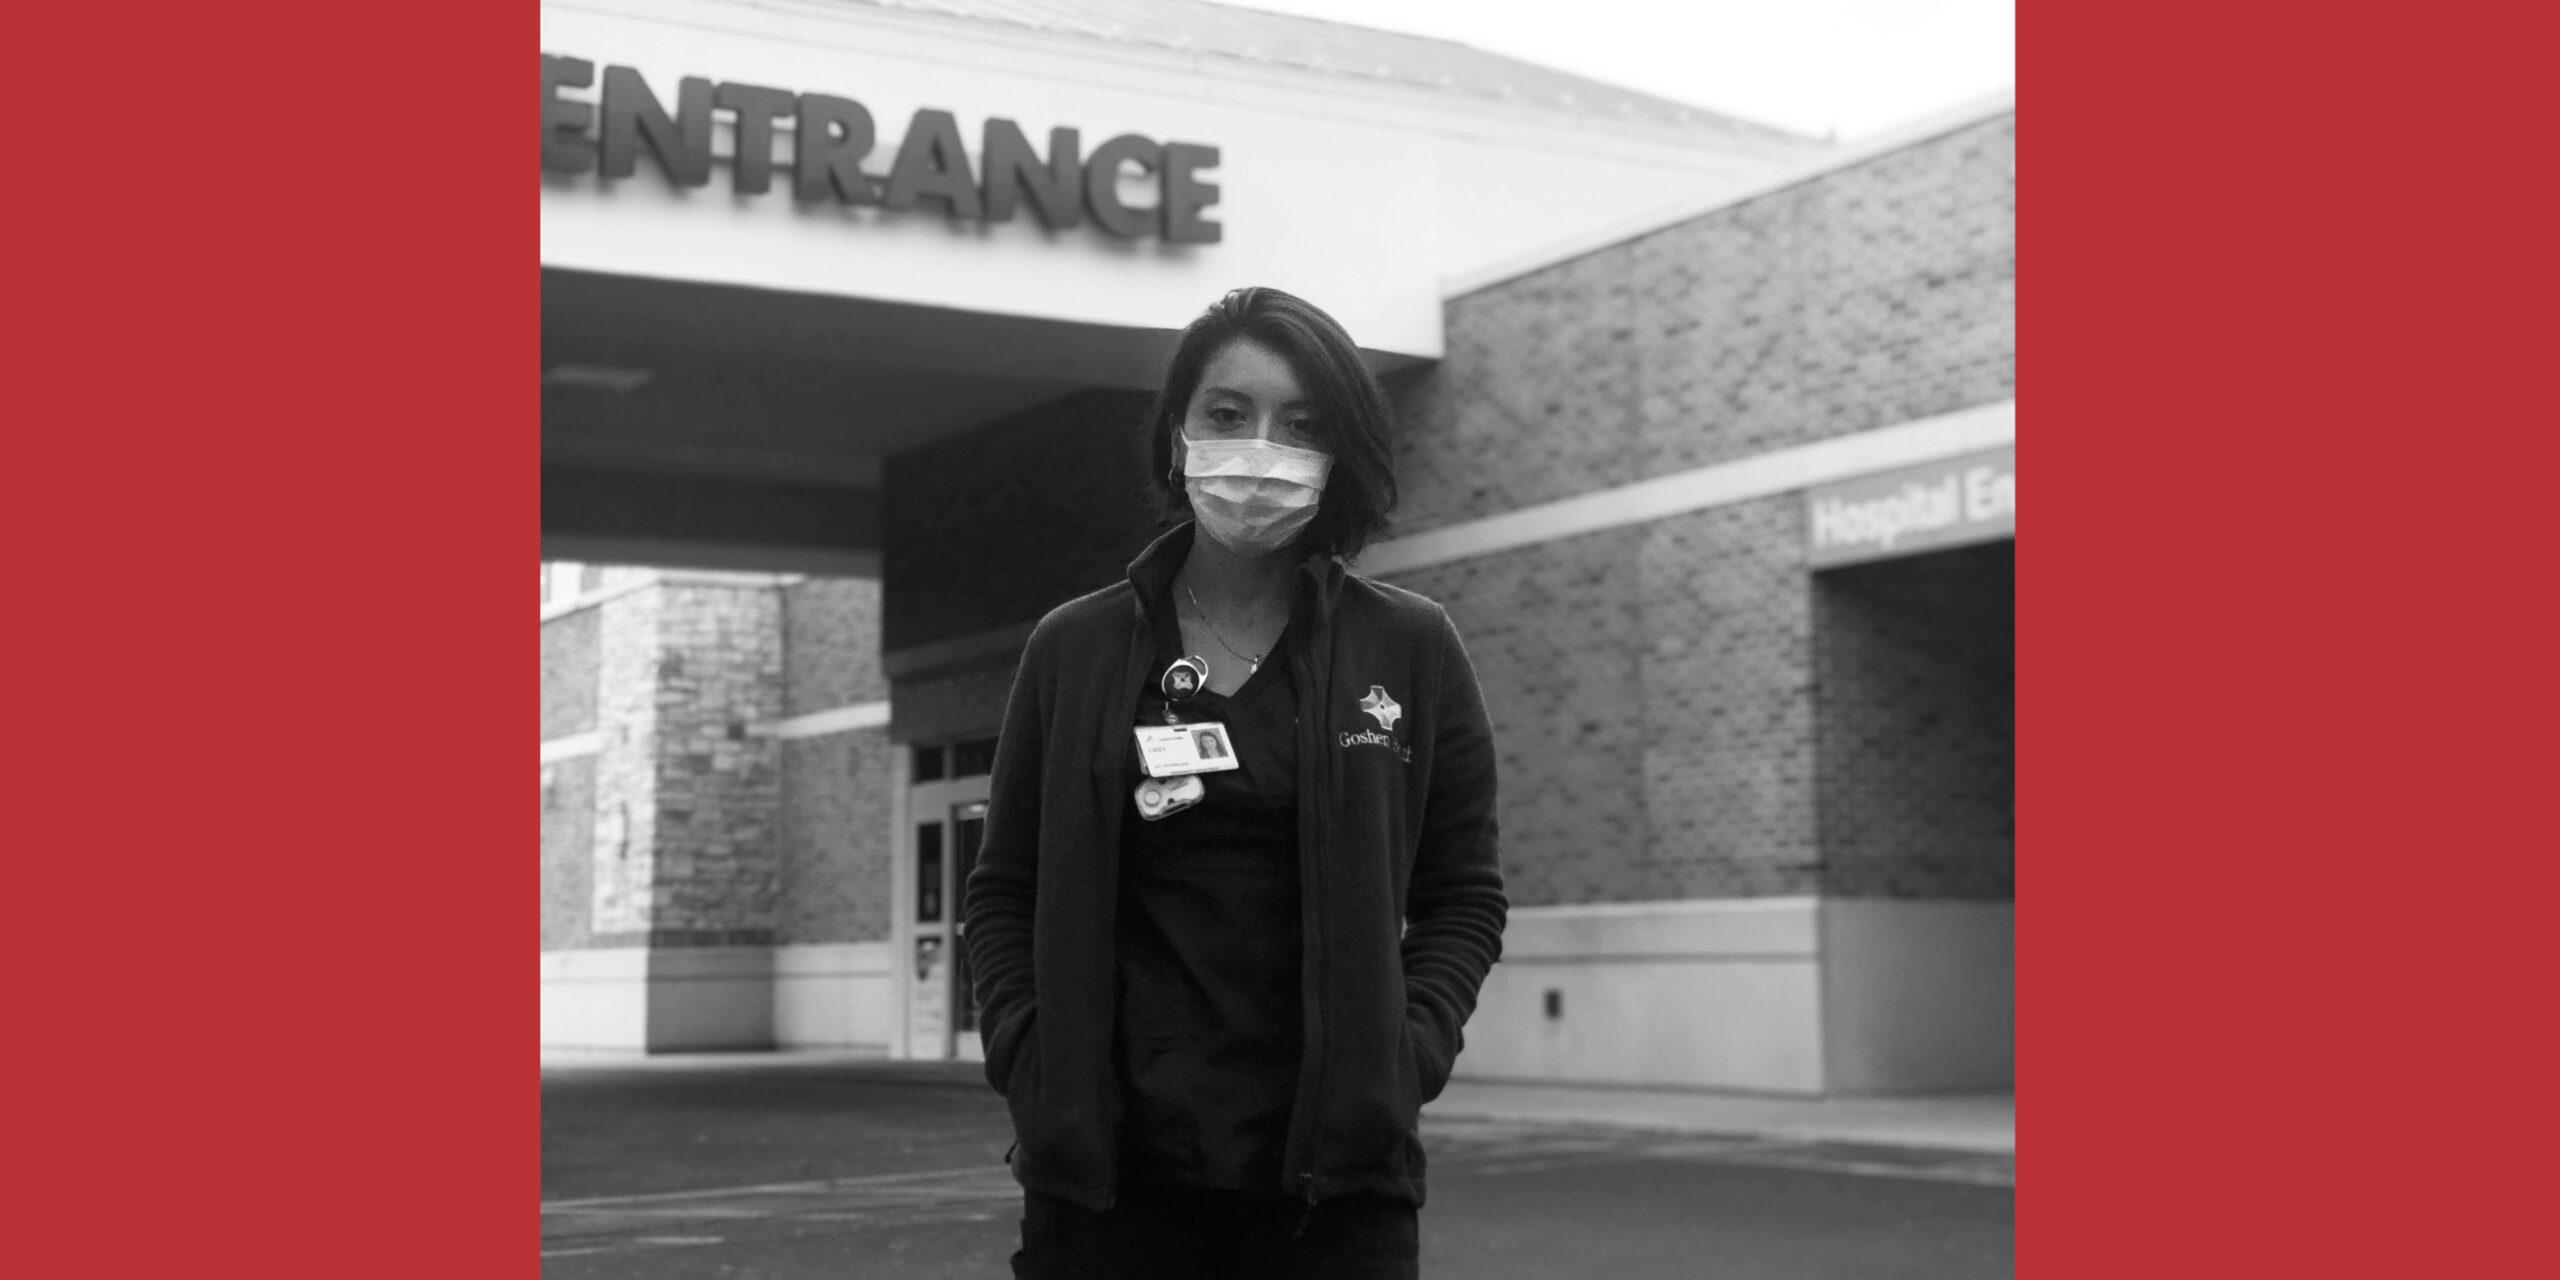 Lizzy Diaz outside a hospital